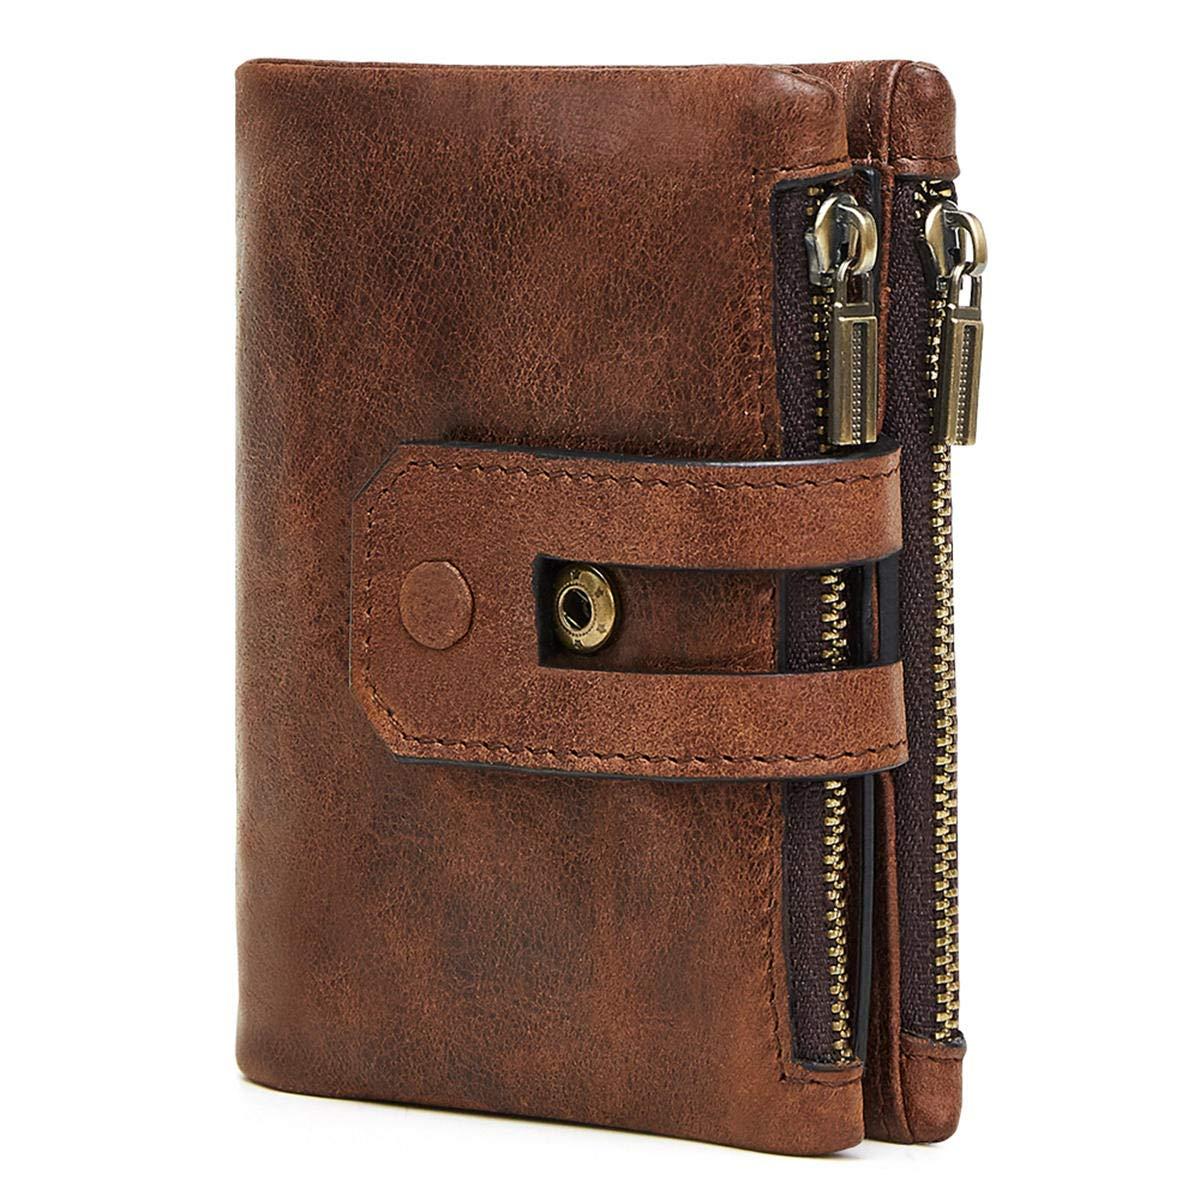 F.S.M. Outdoor Travel Men Slim RFID Leather Bifold Wallet Card Holder Purse Billfold Pocket - Brown by F.S.M.